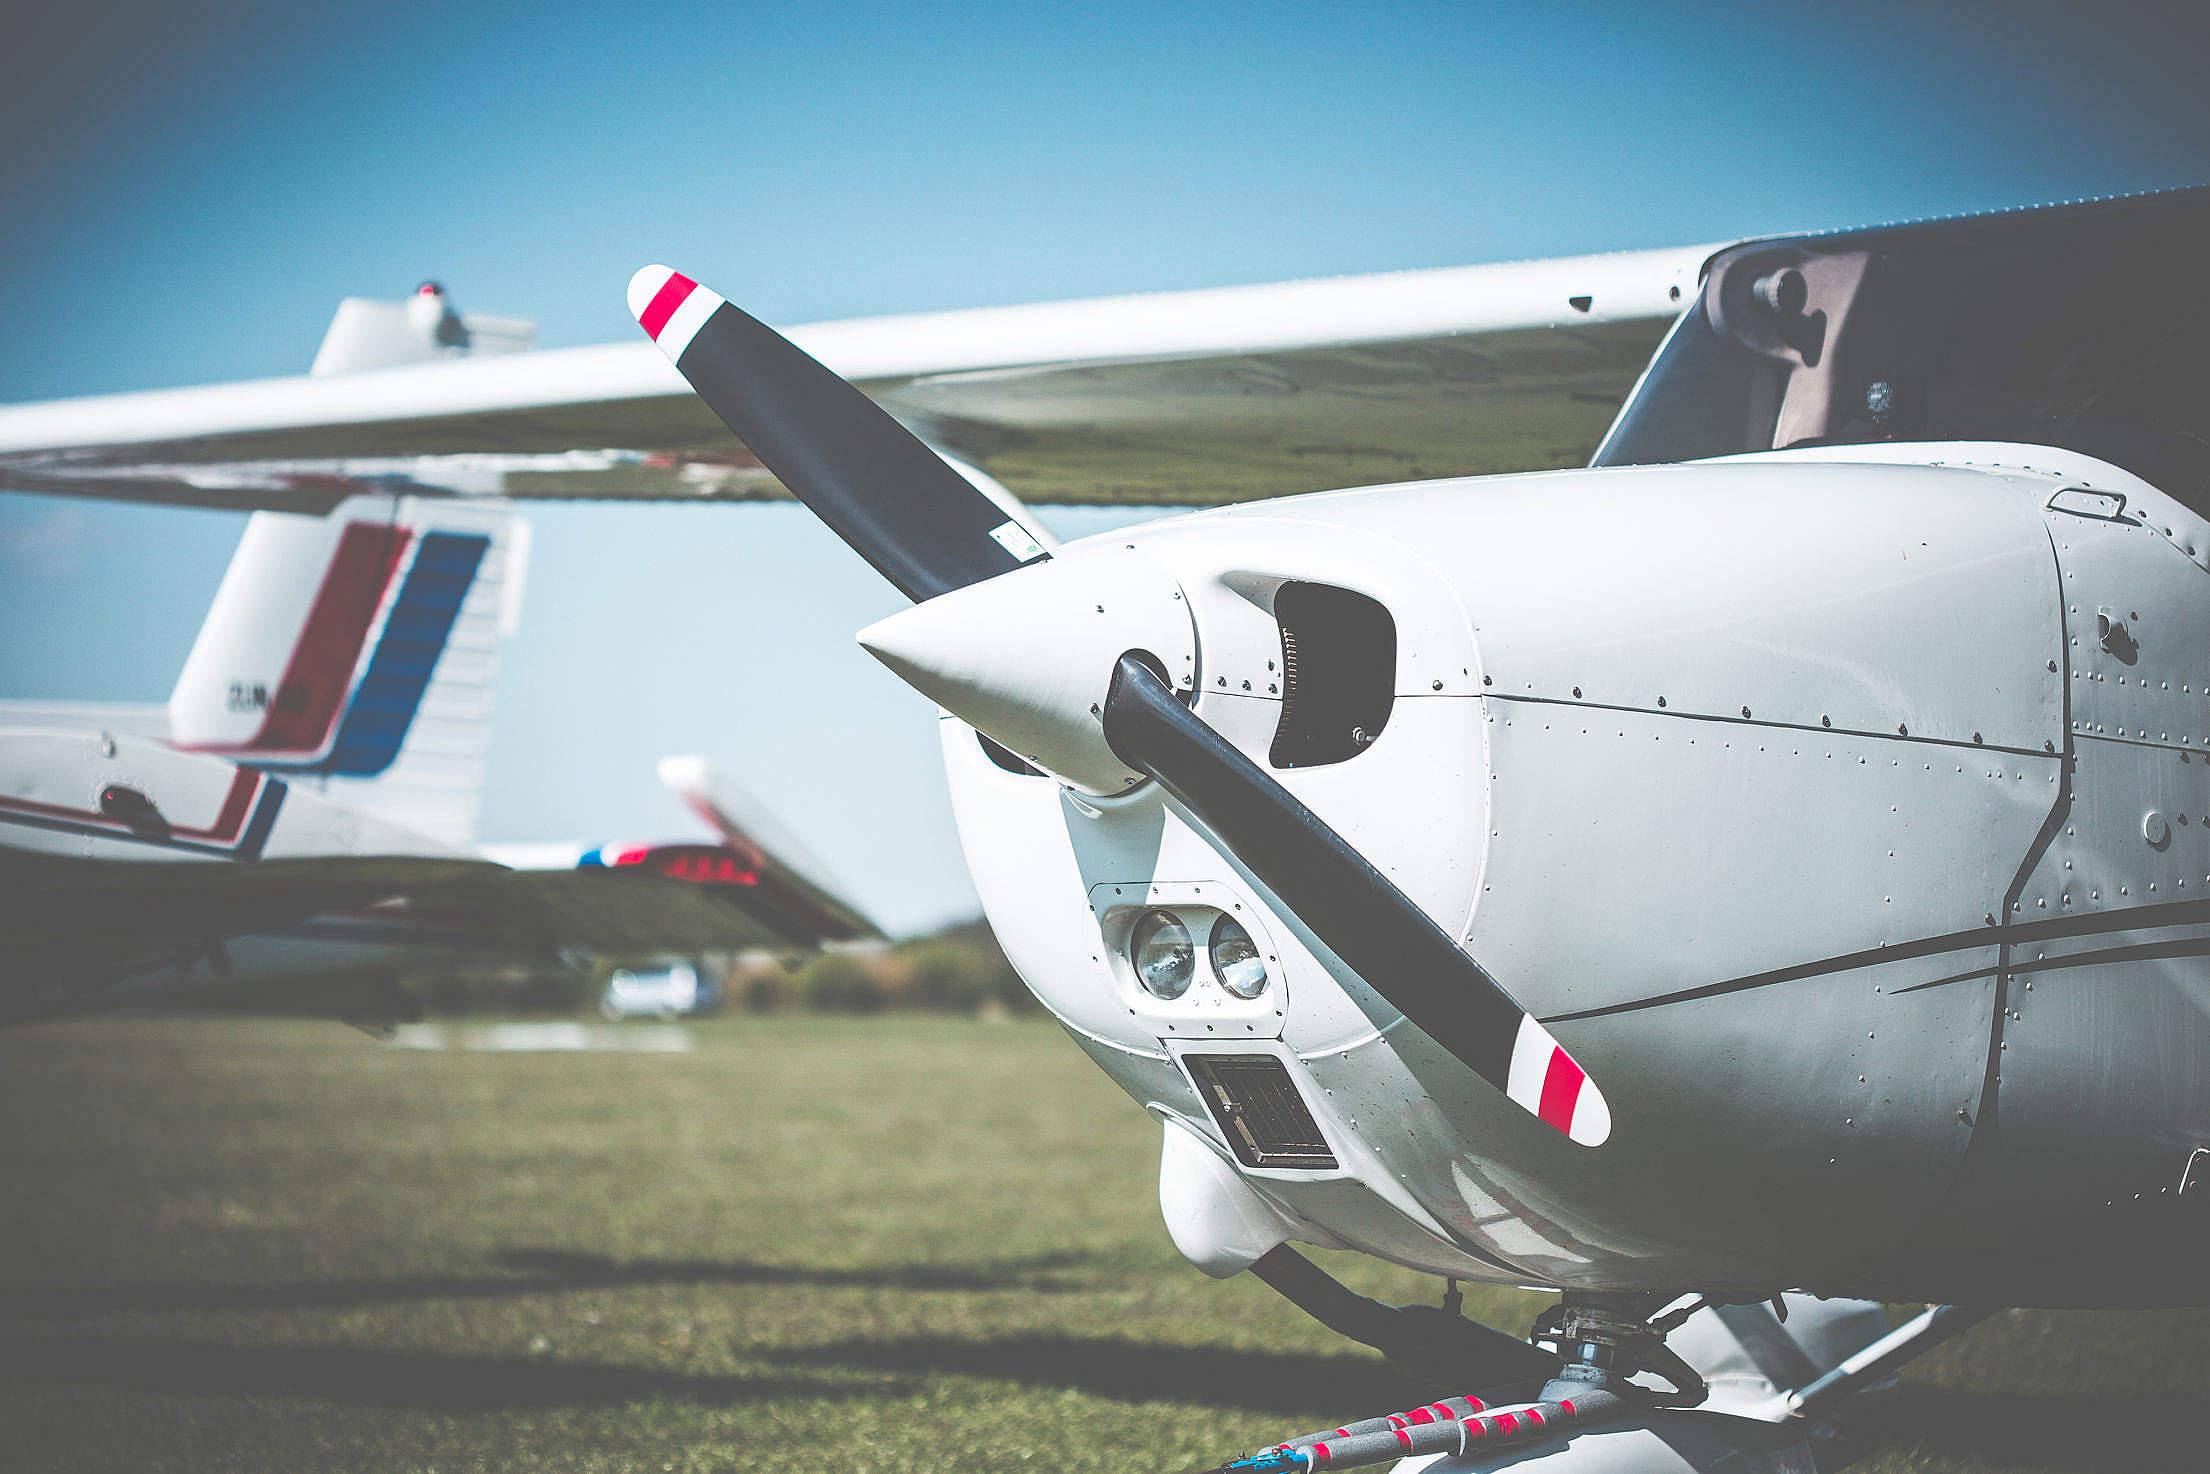 Cessna Airplane Propeller Closeup Free Stock Photo